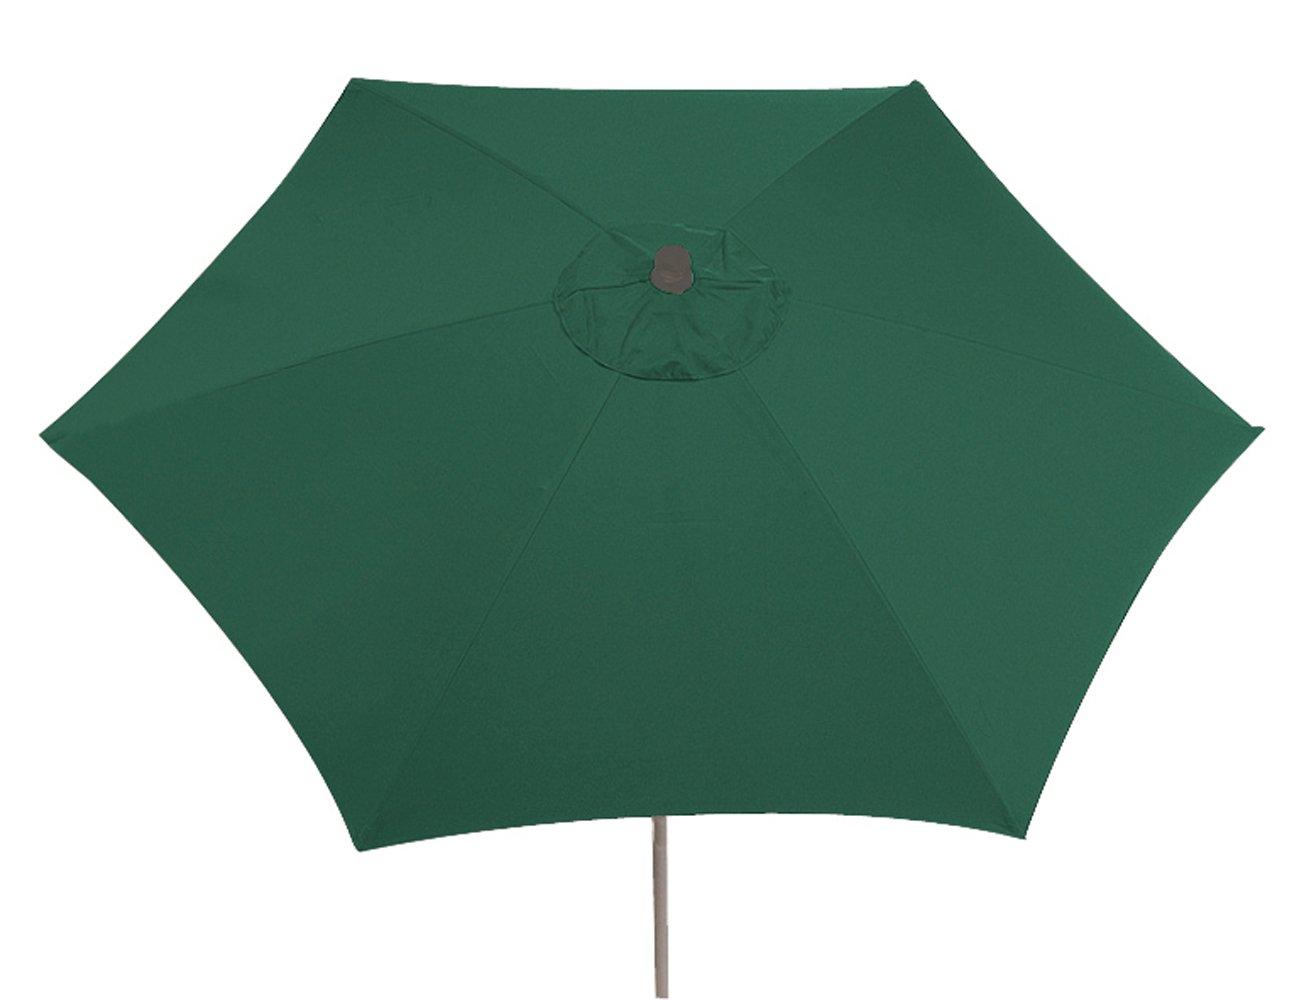 Siena Garden 336876 Sonnenschirm Push Up, Bezug grün Gestell silber 300 cm